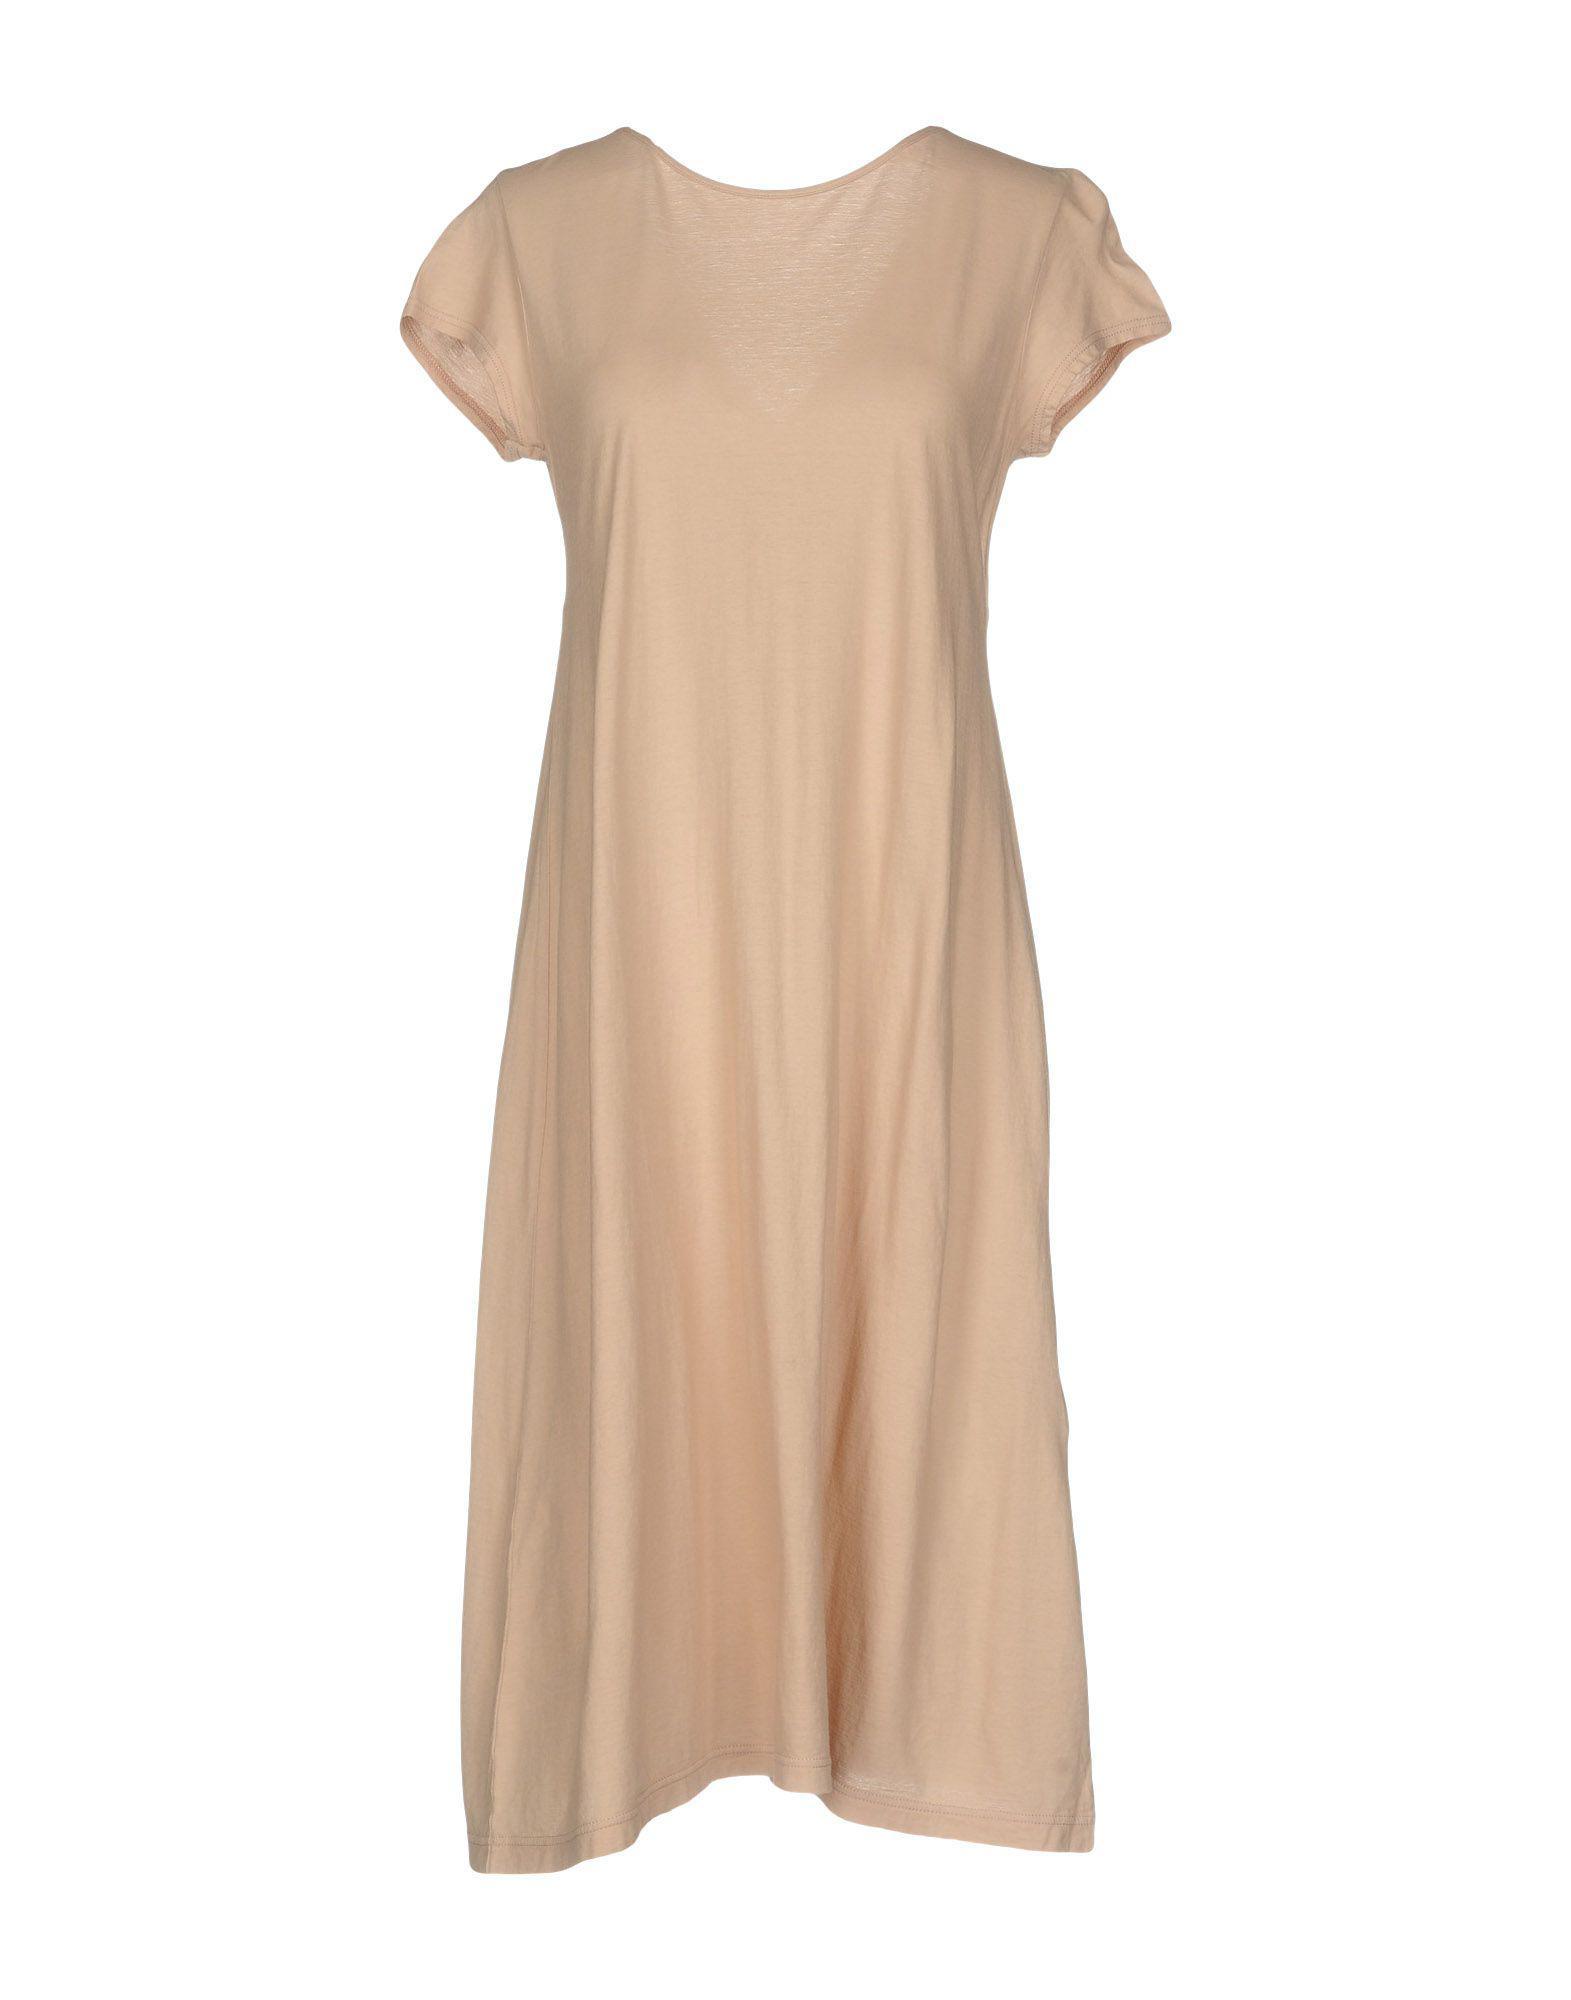 DRESSES - 3/4 length dresses Almeria IB1vsiroh